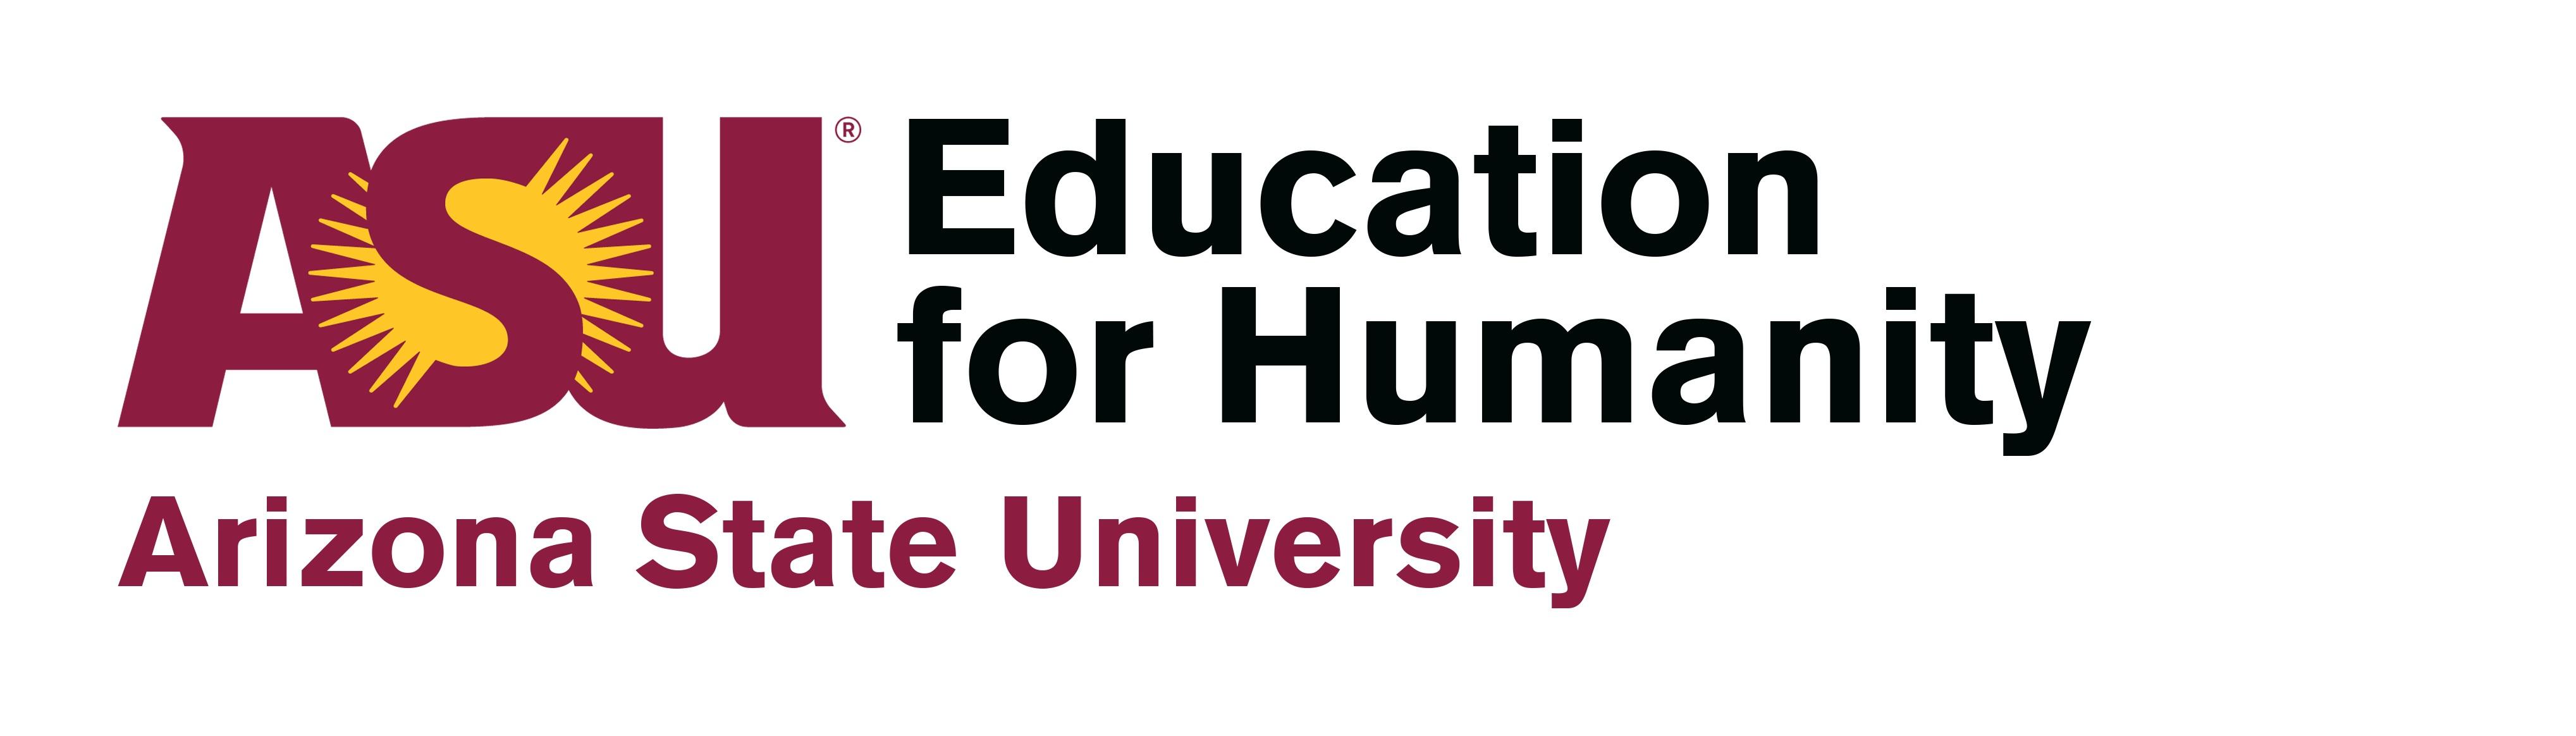 ASU Education for Humanity Logo